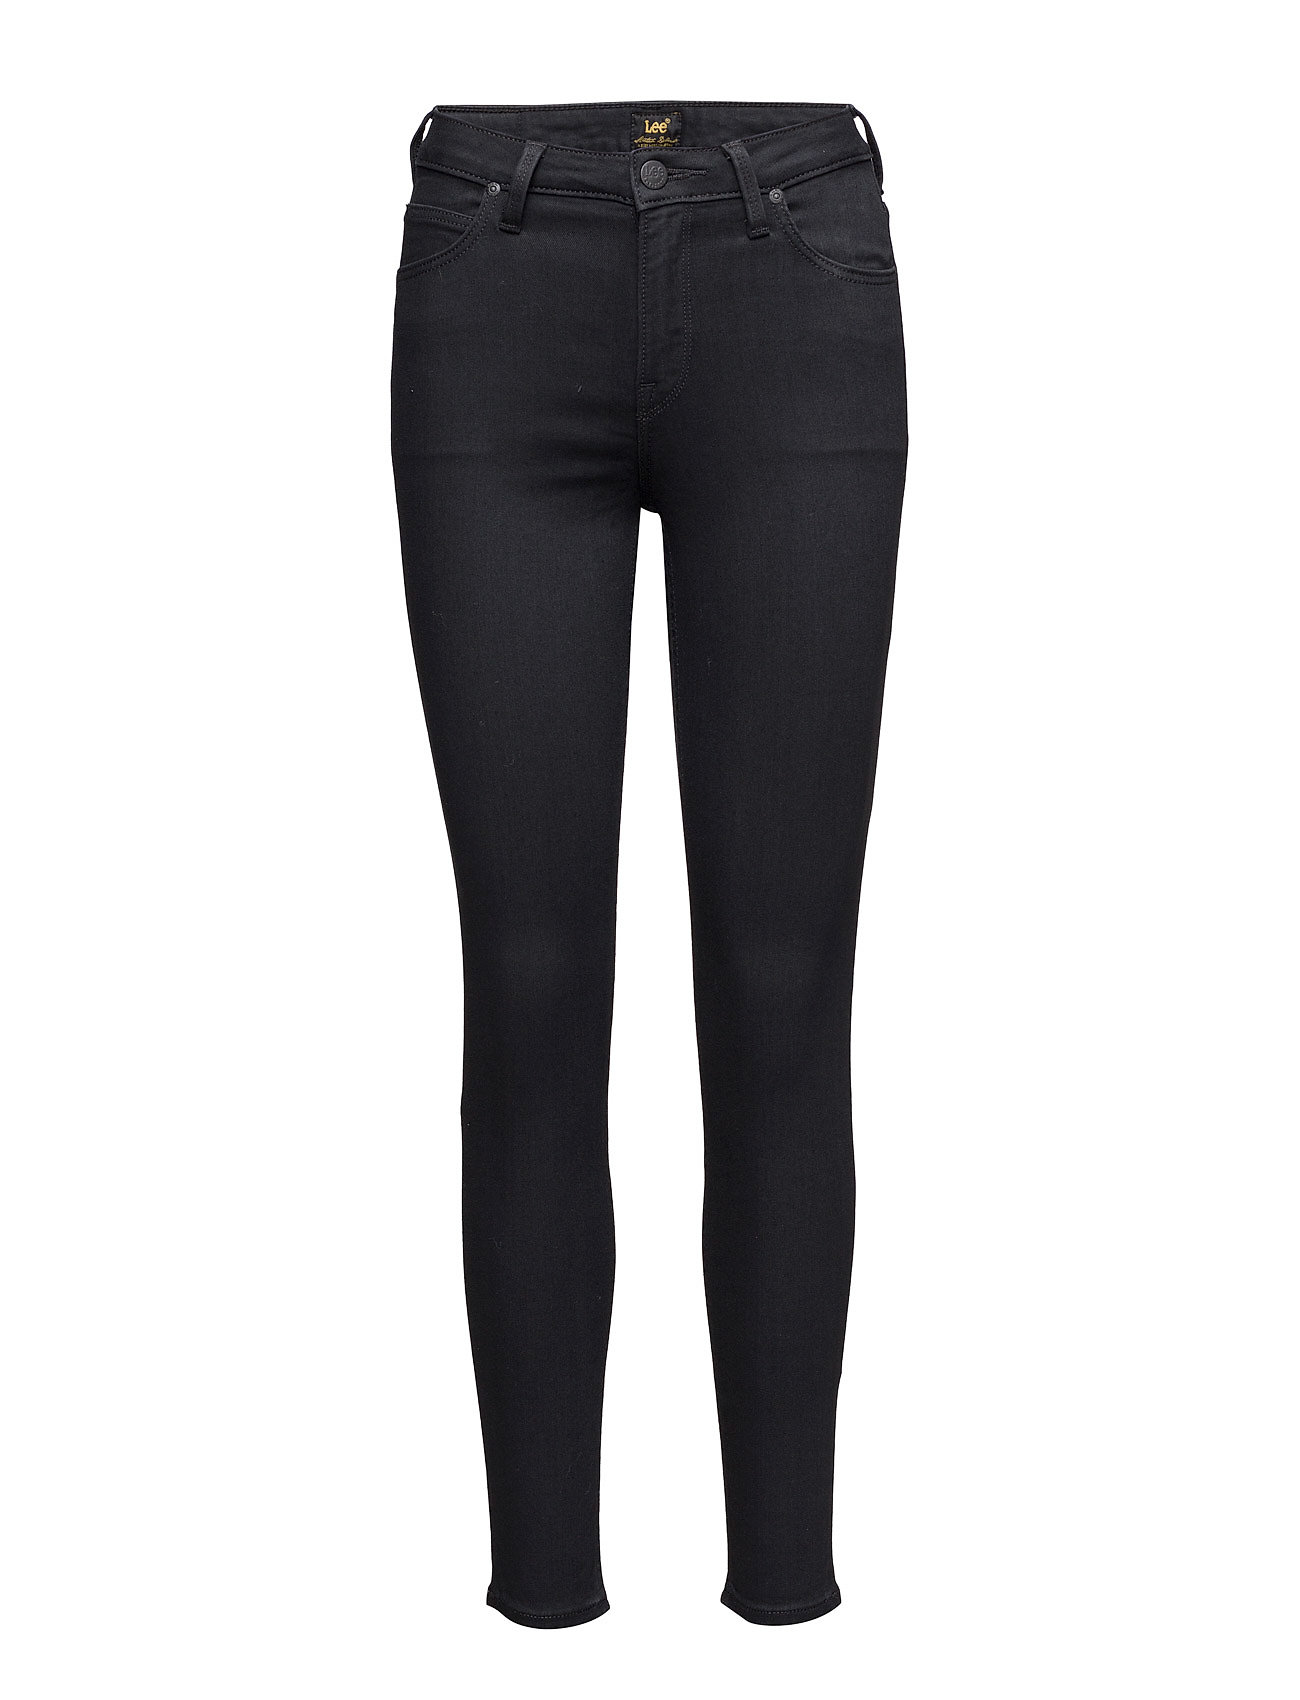 1663eaa9 Scarlett High (Black Rinse) (£75) - Lee Jeans - | Boozt.com